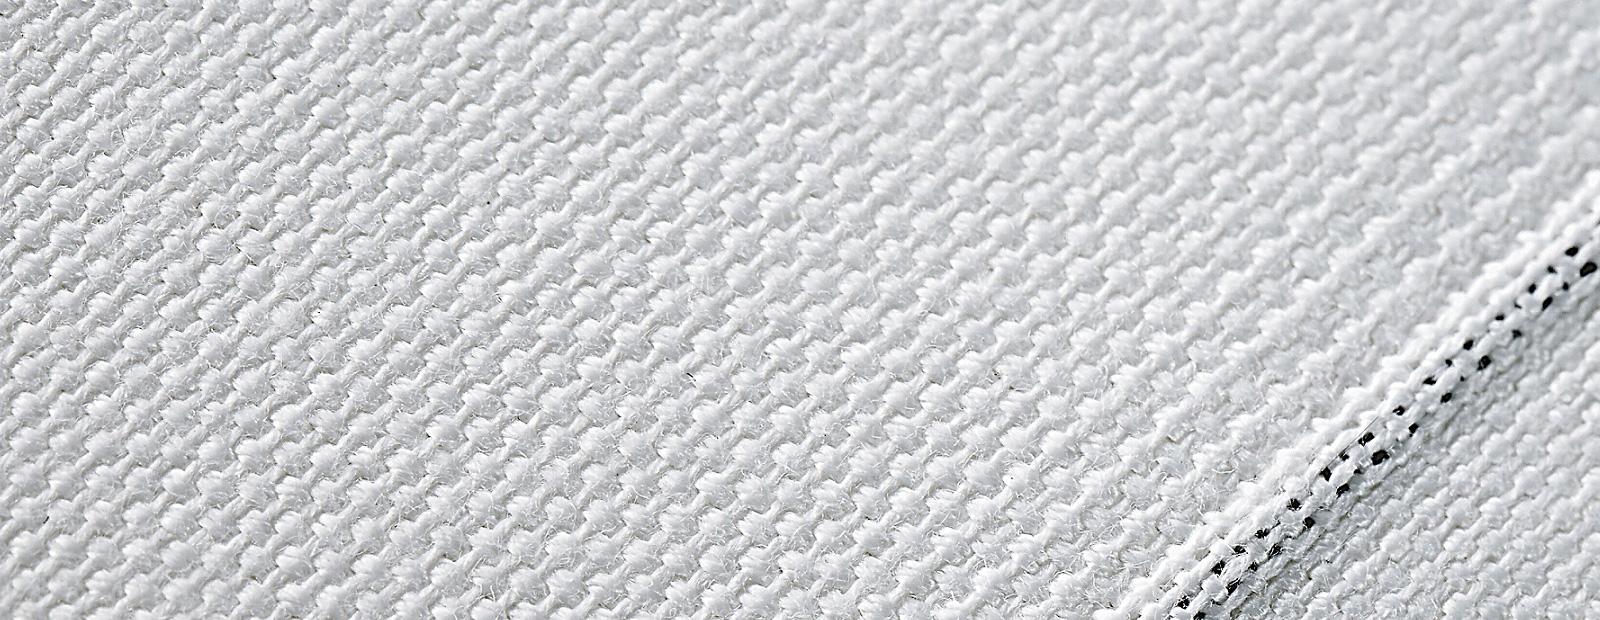 3056_z_carbon-texture-per-web-1600x620.jpg